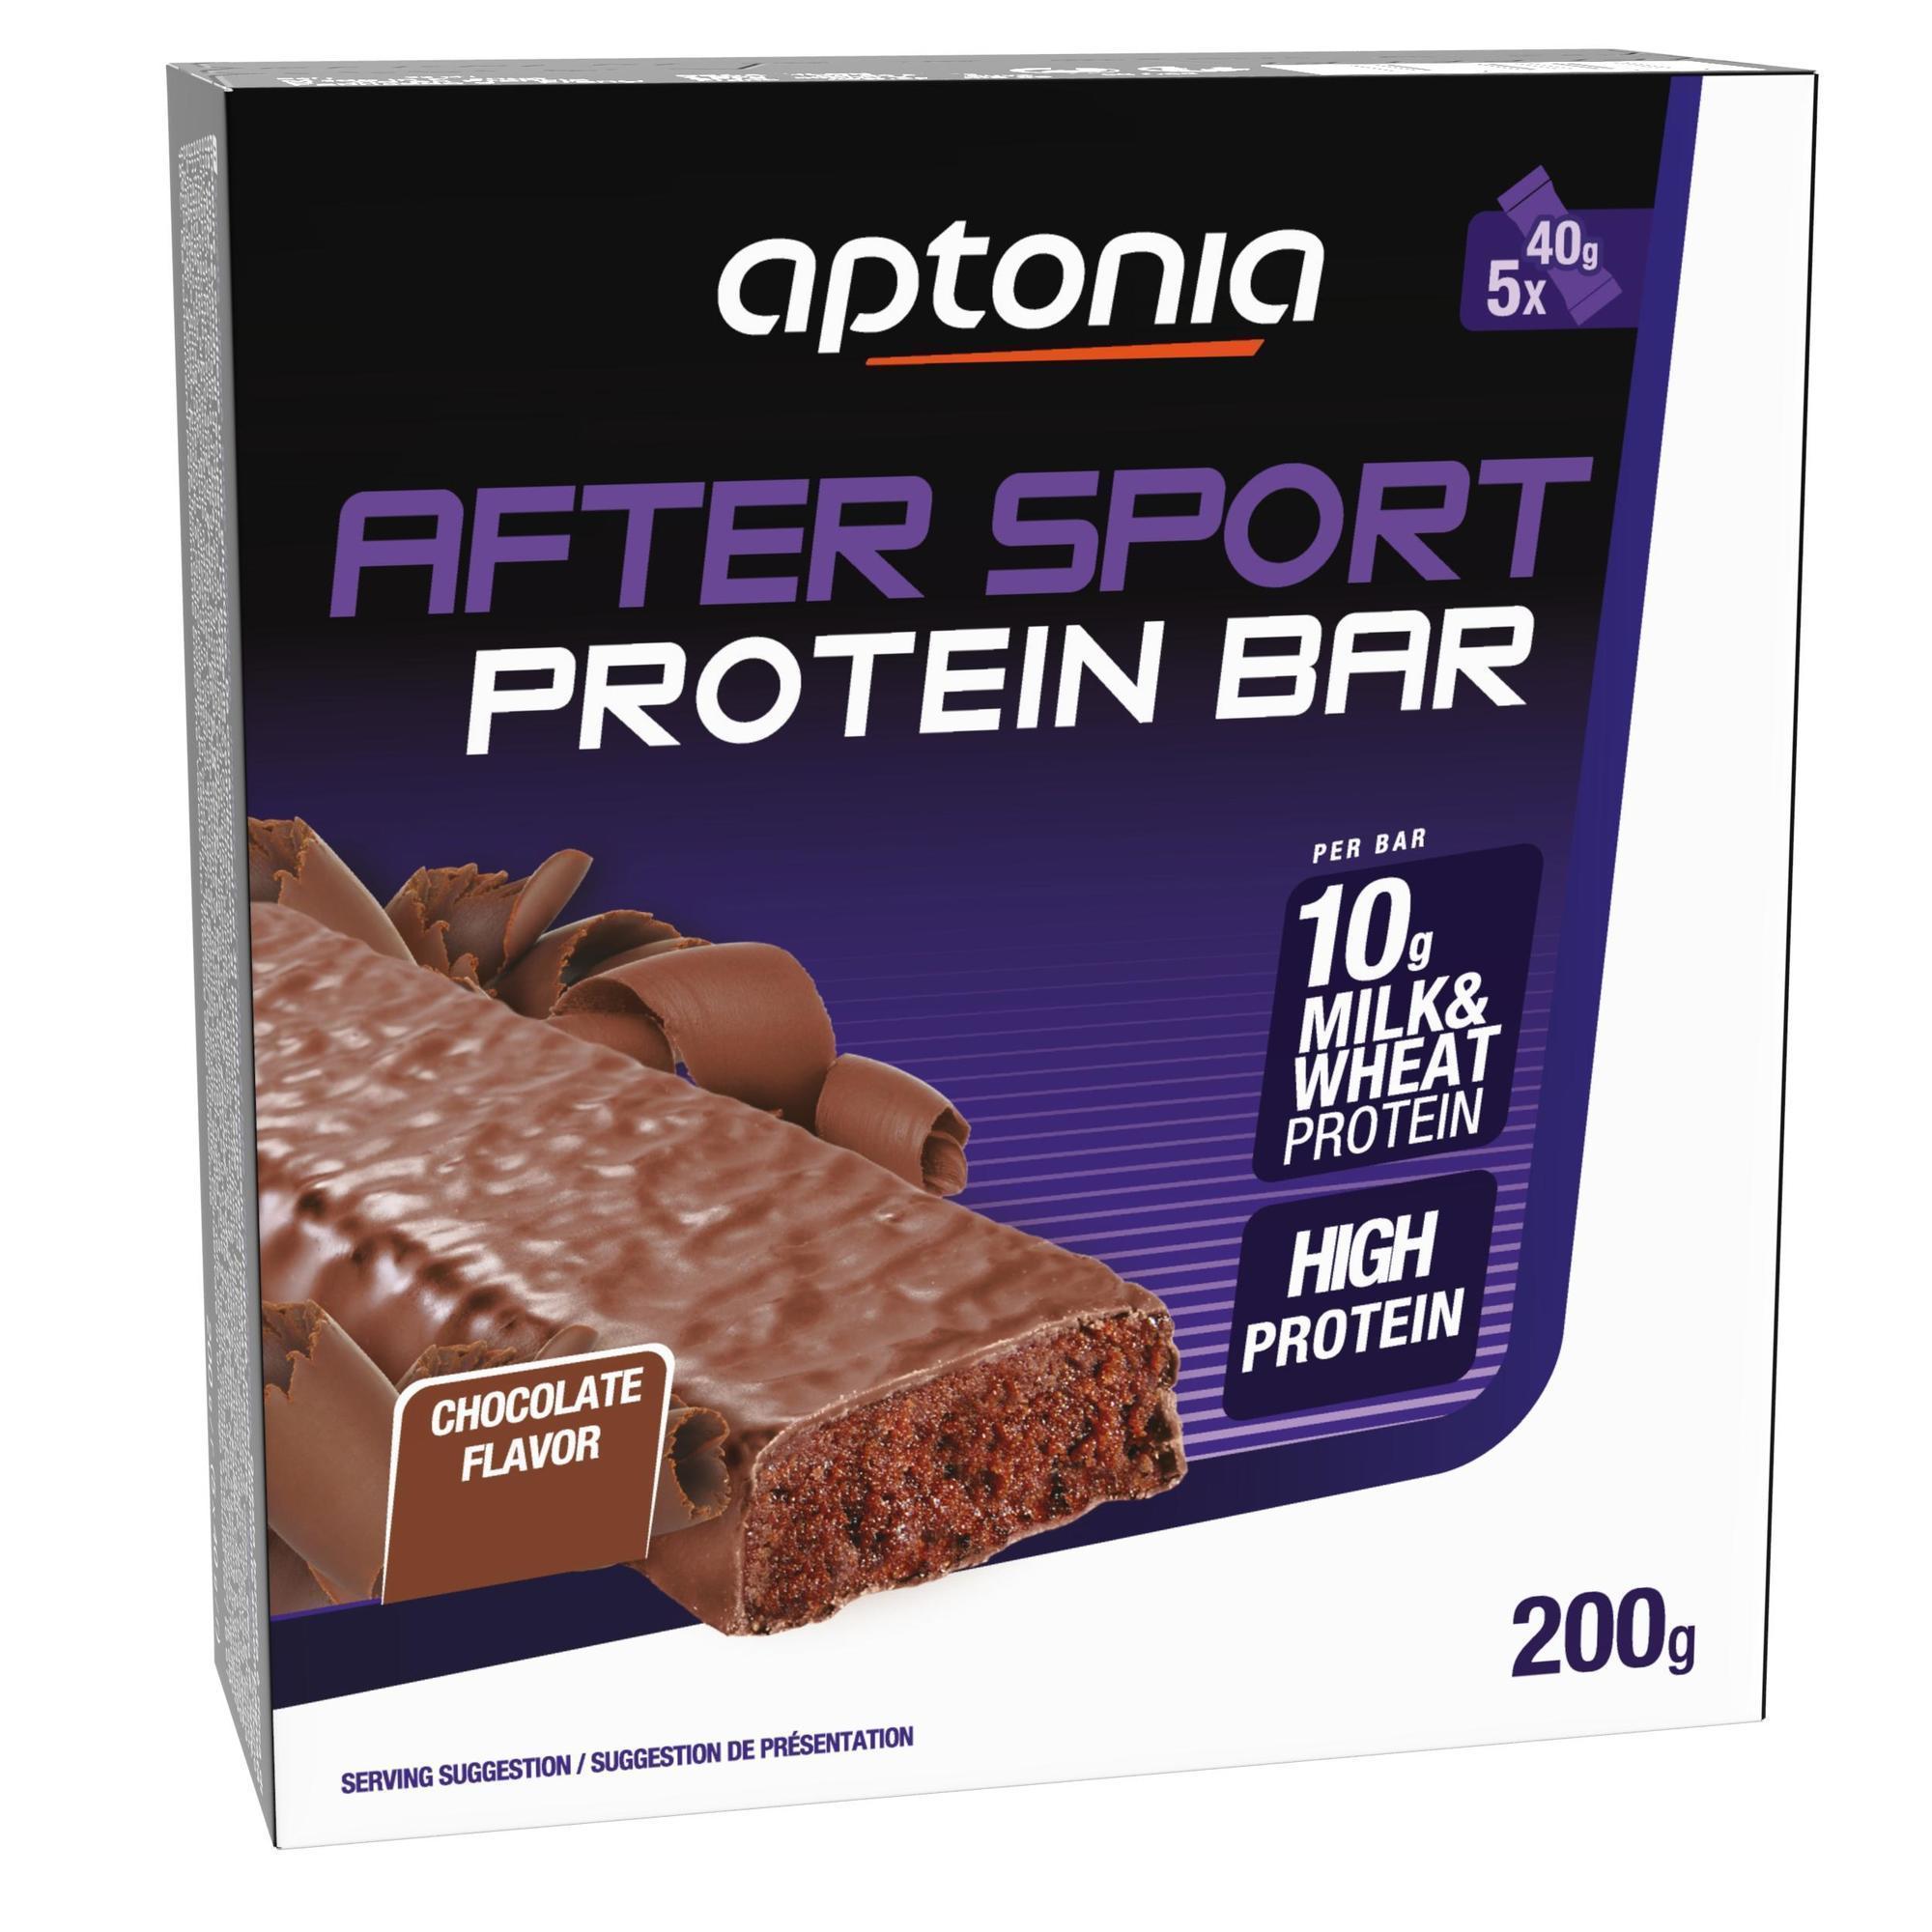 5 X BARRITA PROTEICA AFTER SPORT CHOCOLATE